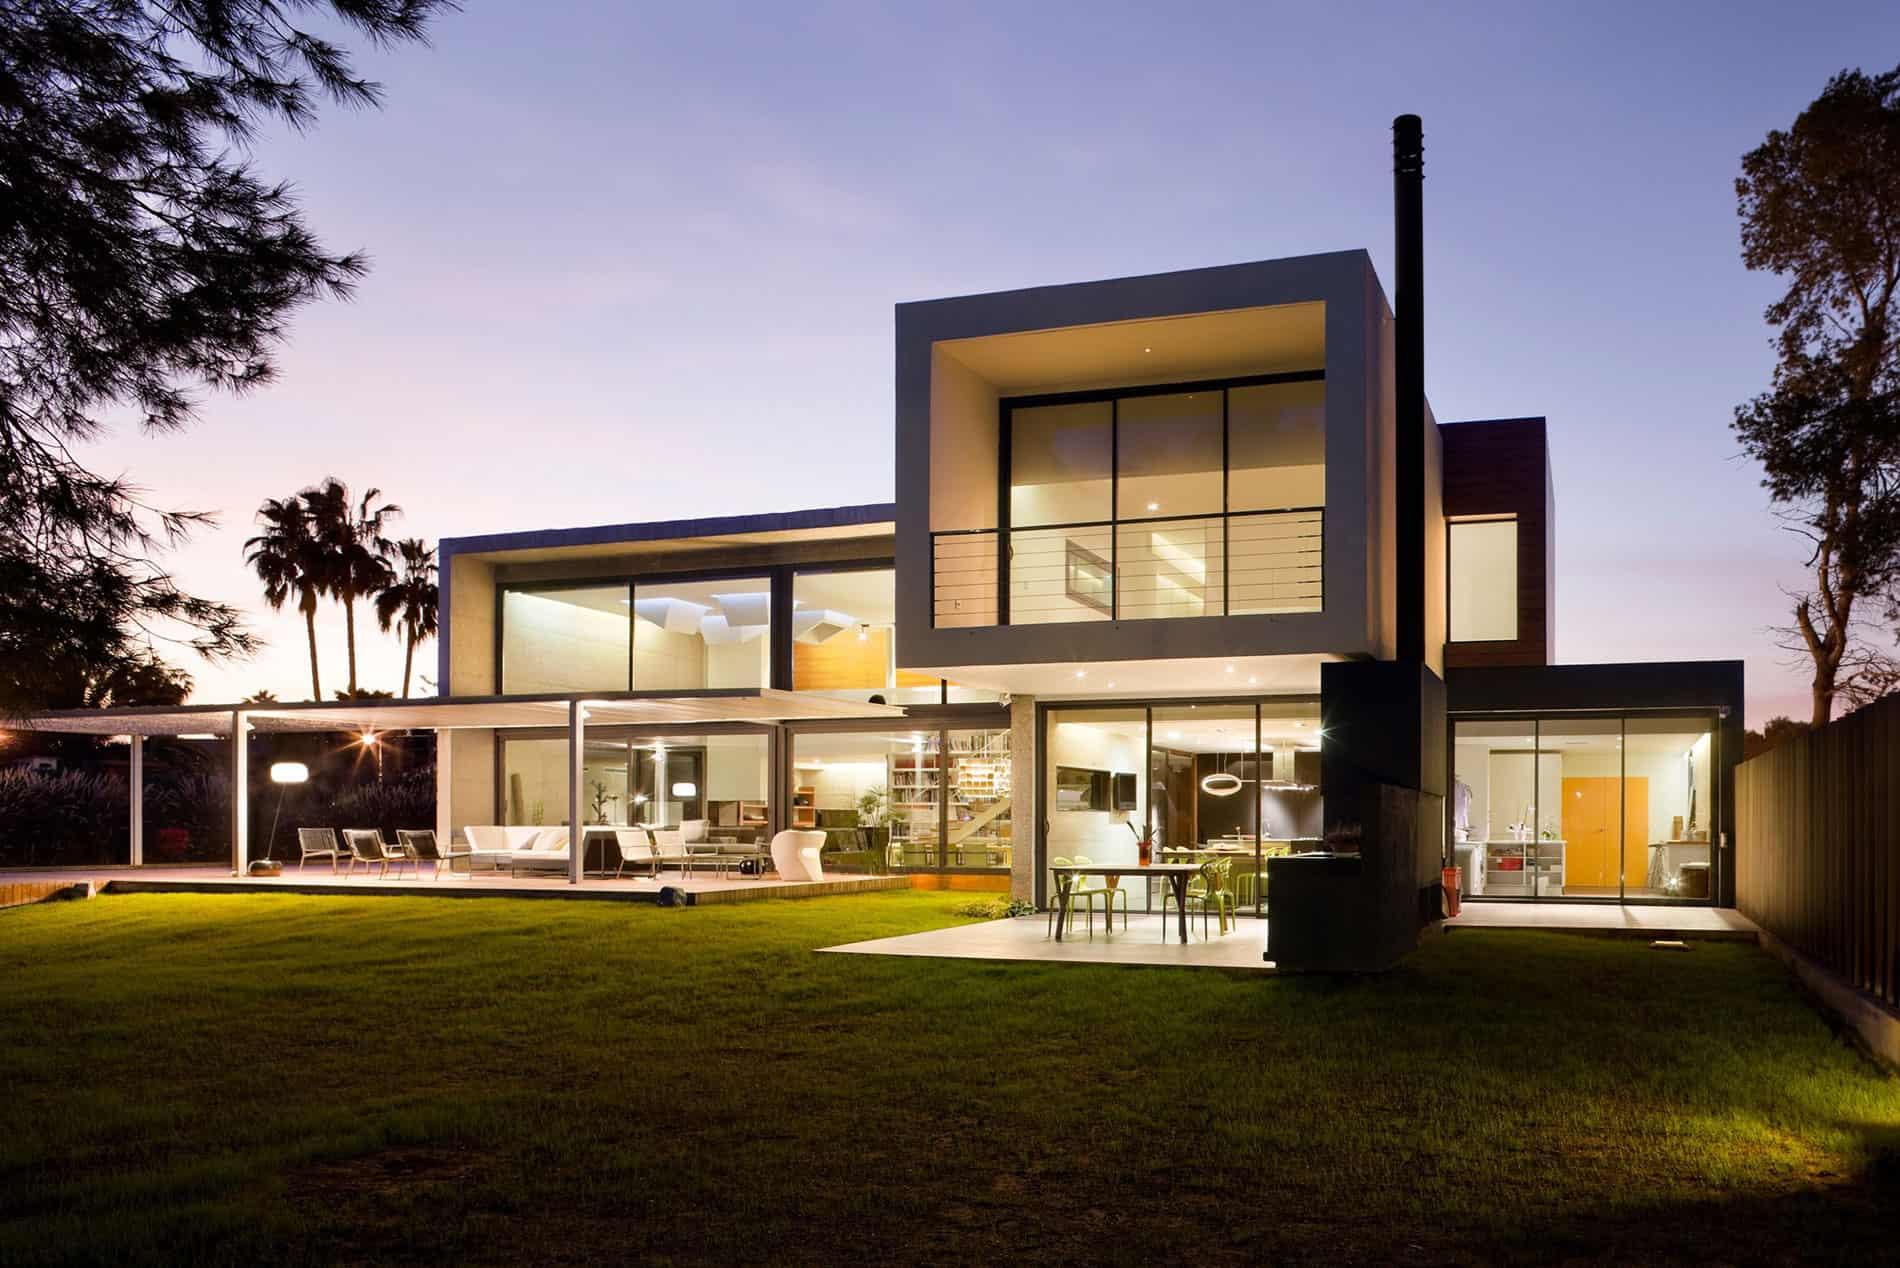 D e house by sanahuja and partners - Casas prefabricadas mediterraneas ...